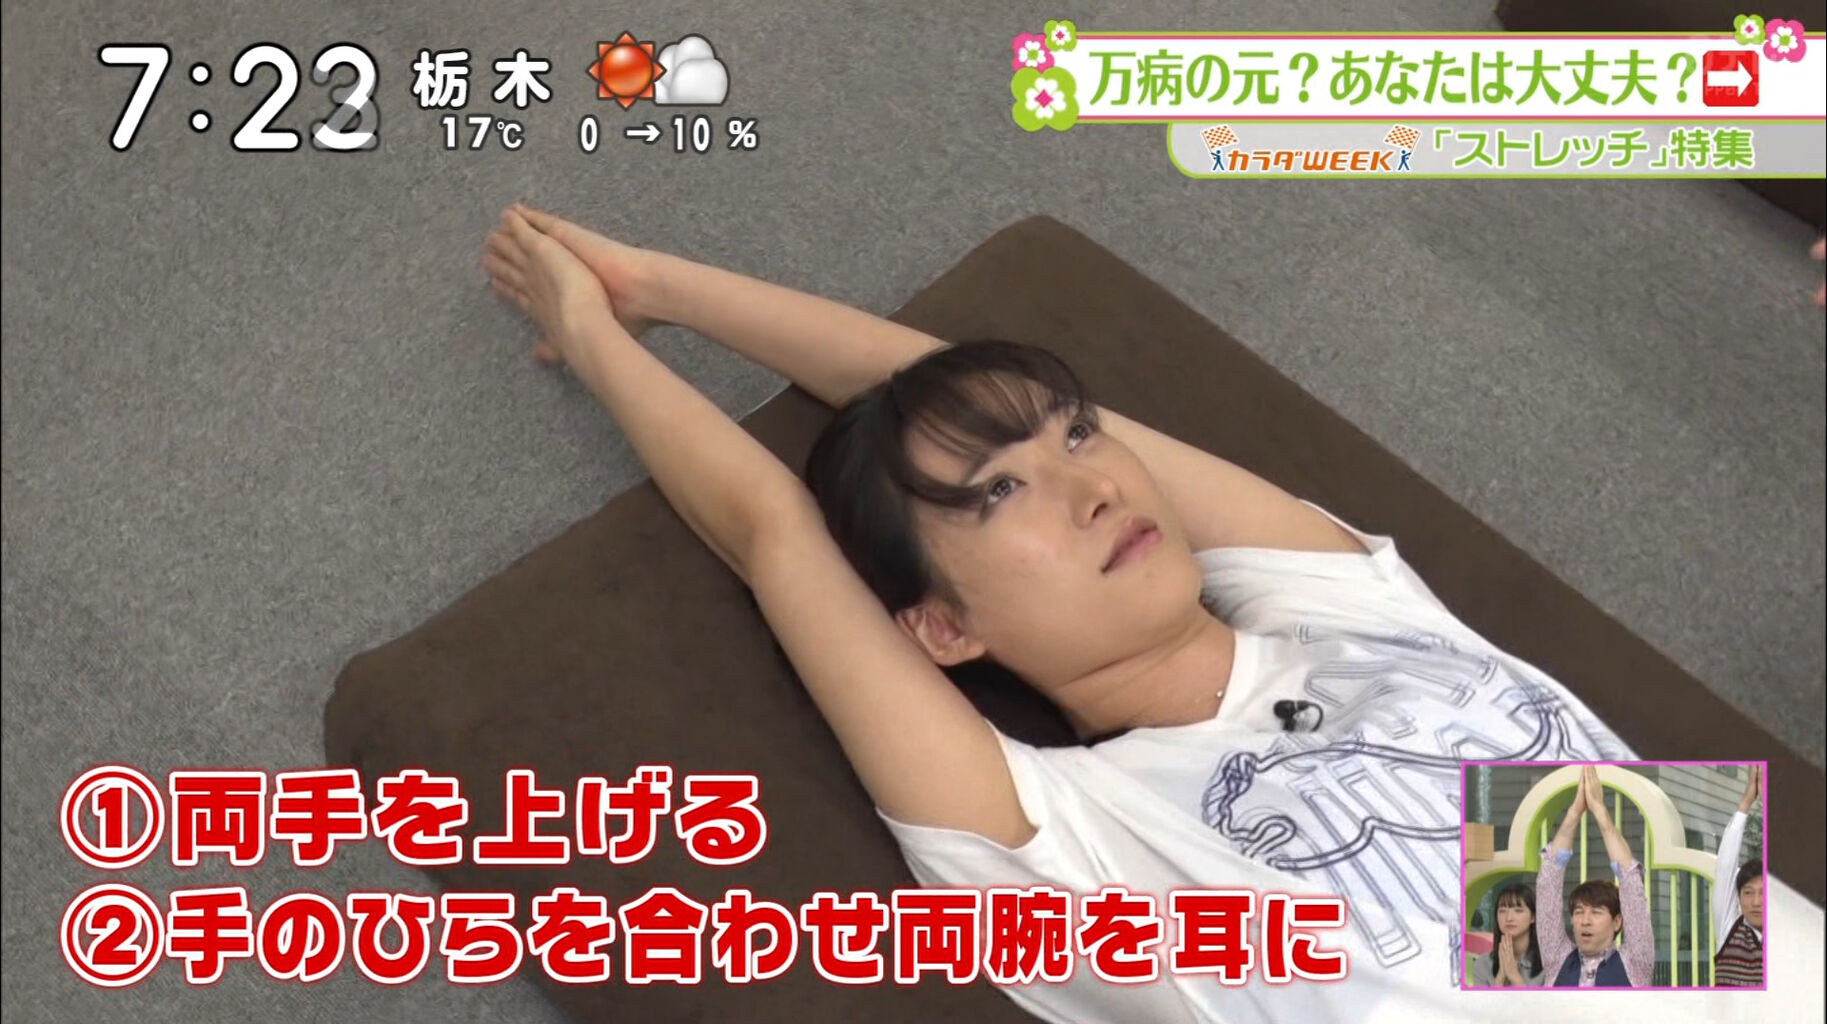 https://livedoor.blogimg.jp/himahiki/imgs/c/8/c8289f3d.jpg